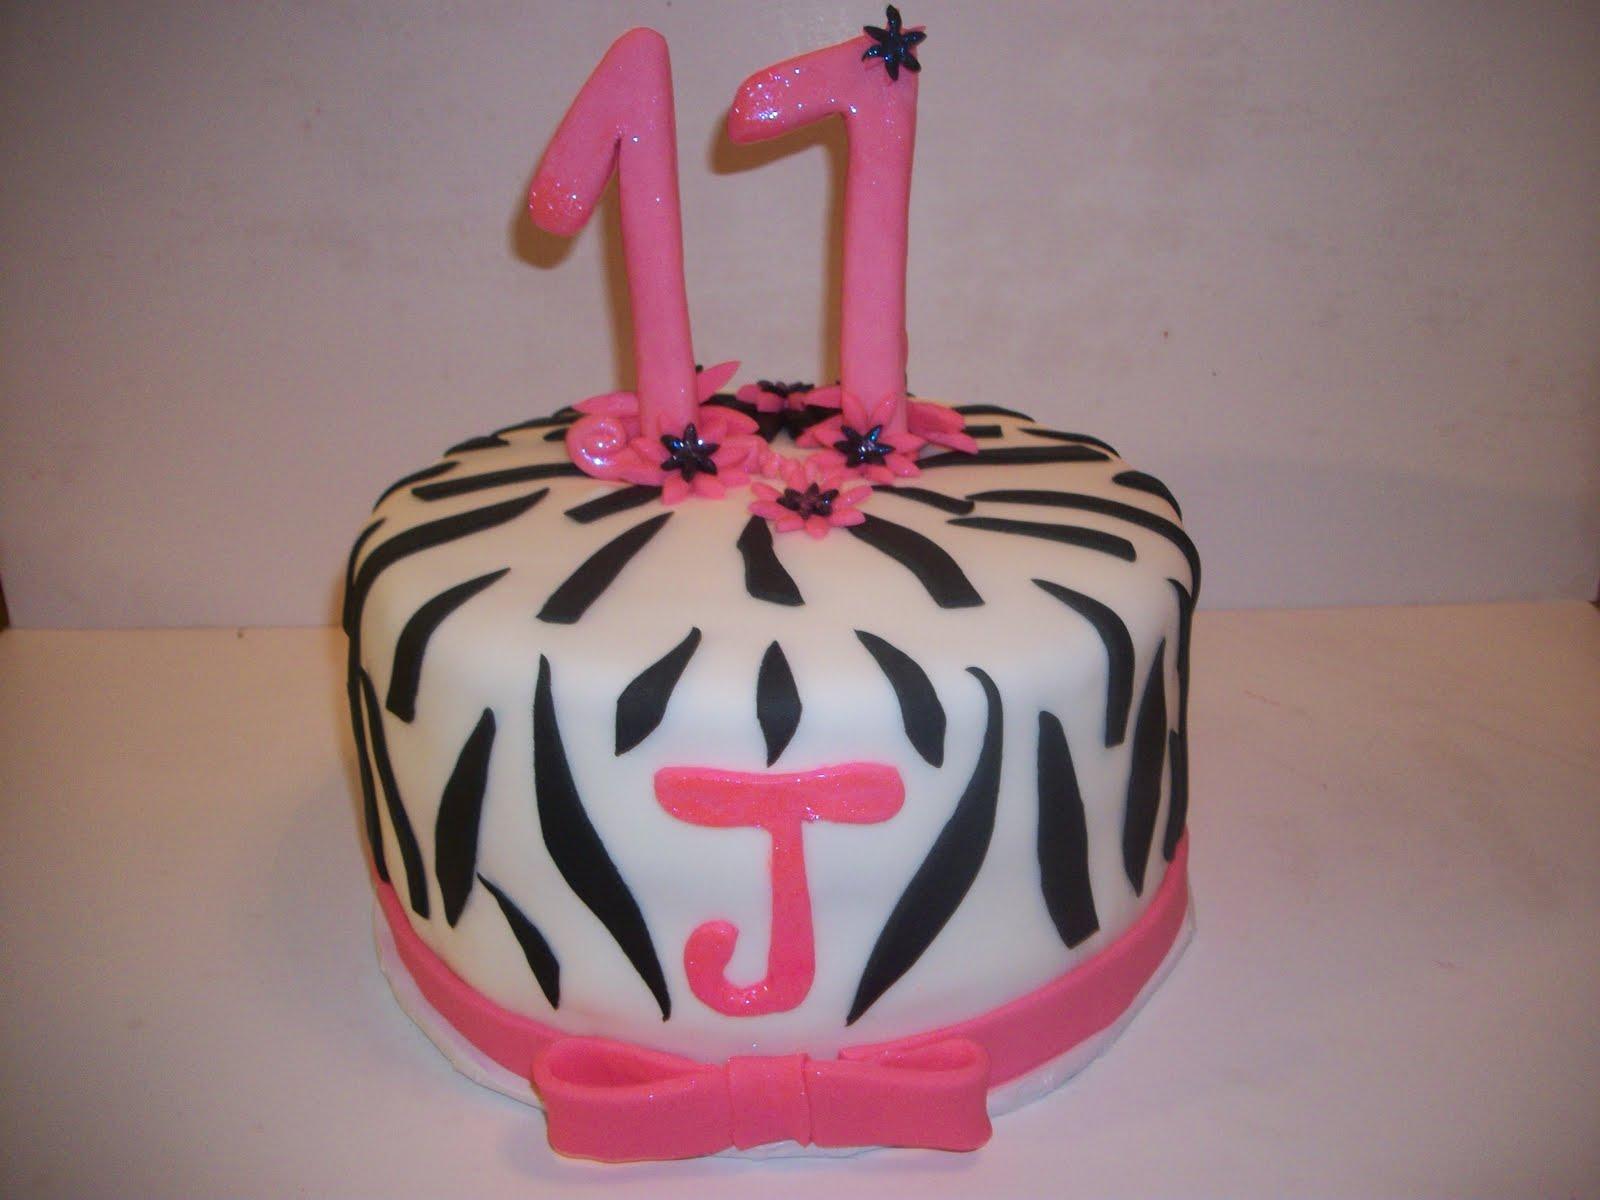 Tasty Cakes: Happy 17th Birthday